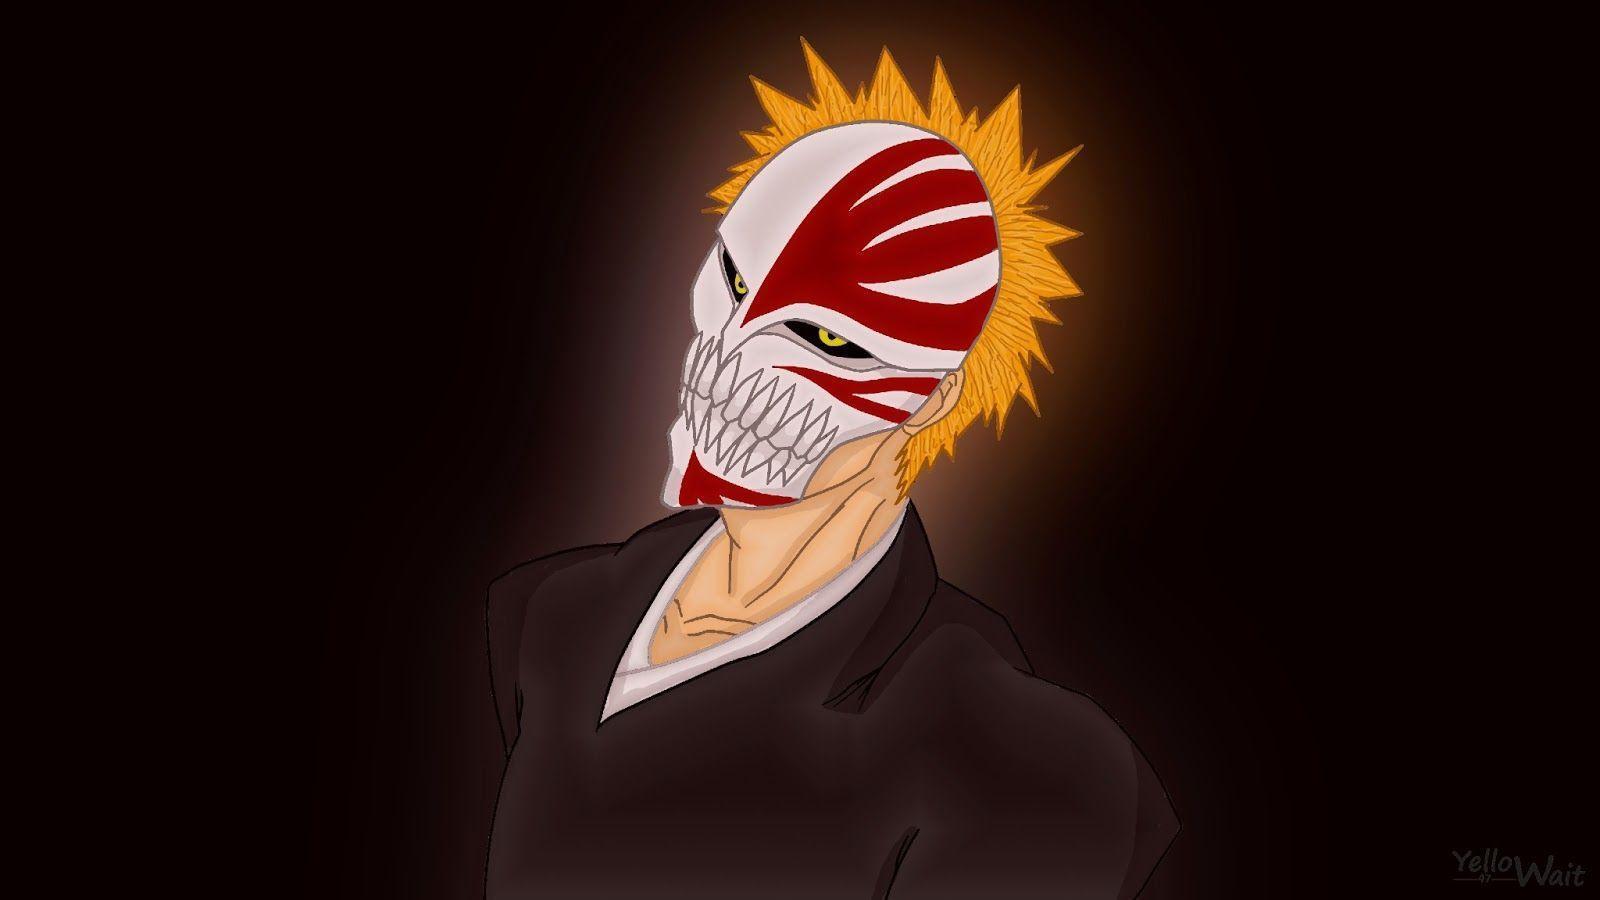 Vizard ichigo wallpapers wallpaper cave - Ichigo vizard mask ...